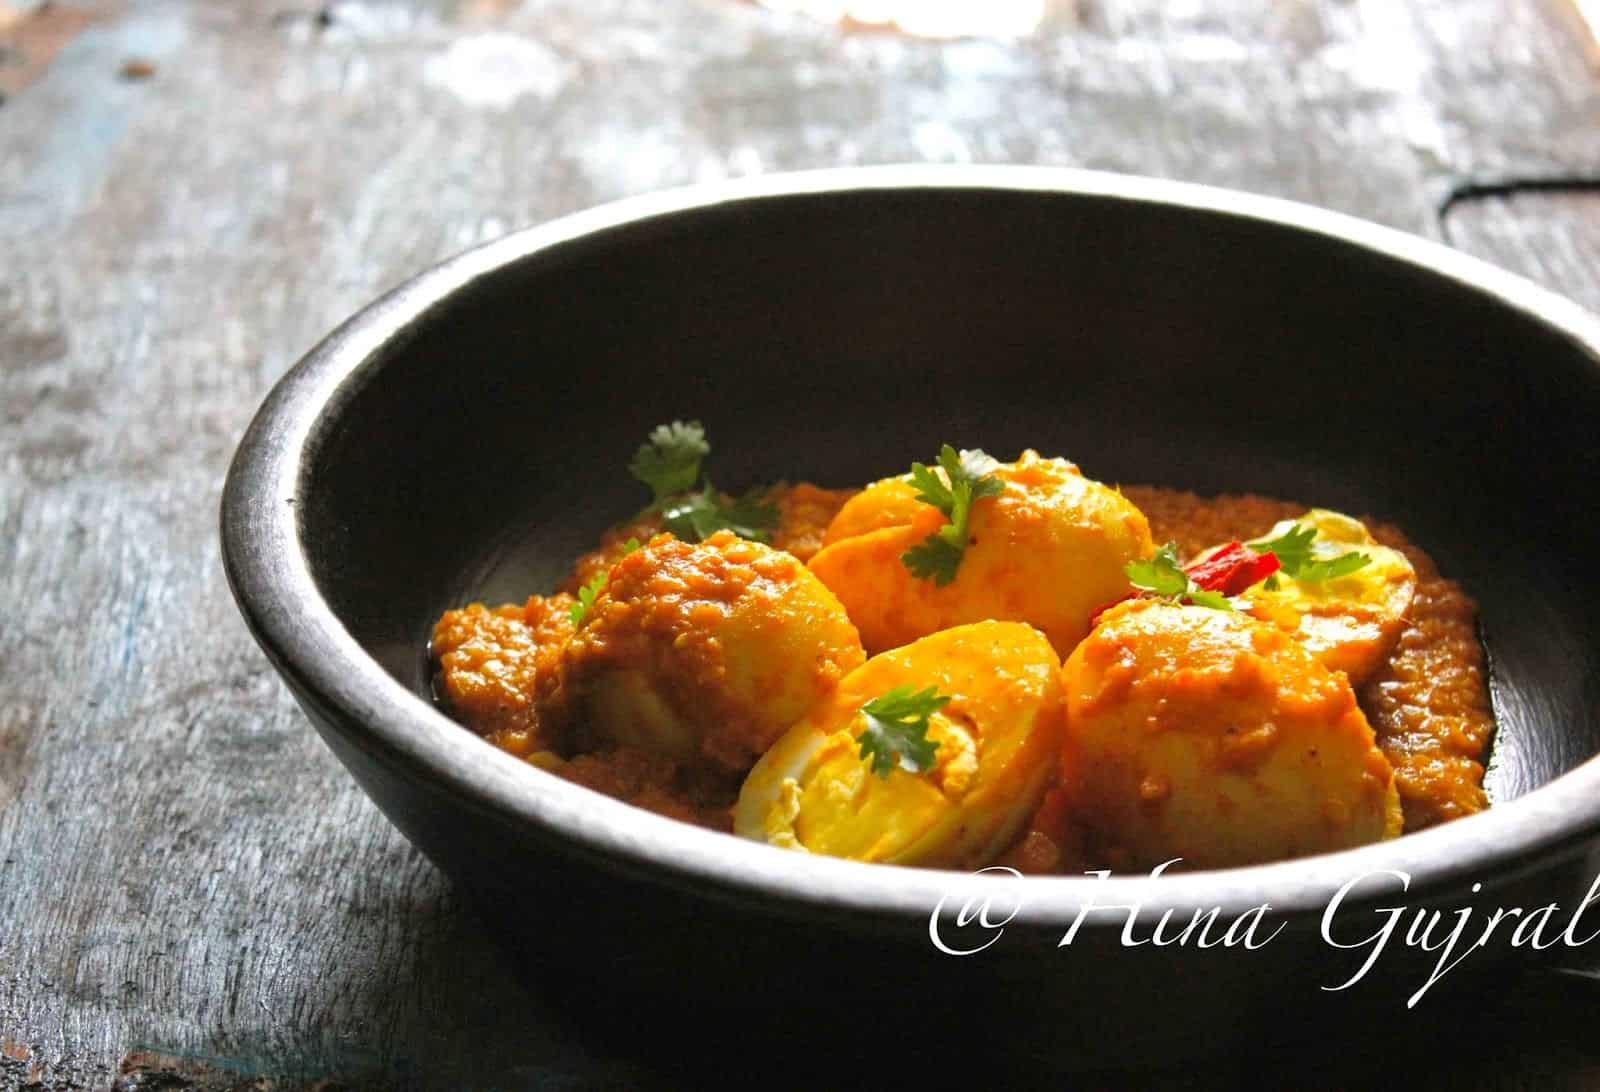 Mughlai egg curry recipe fun food and frolic mughlai egg curry recipe forumfinder Gallery